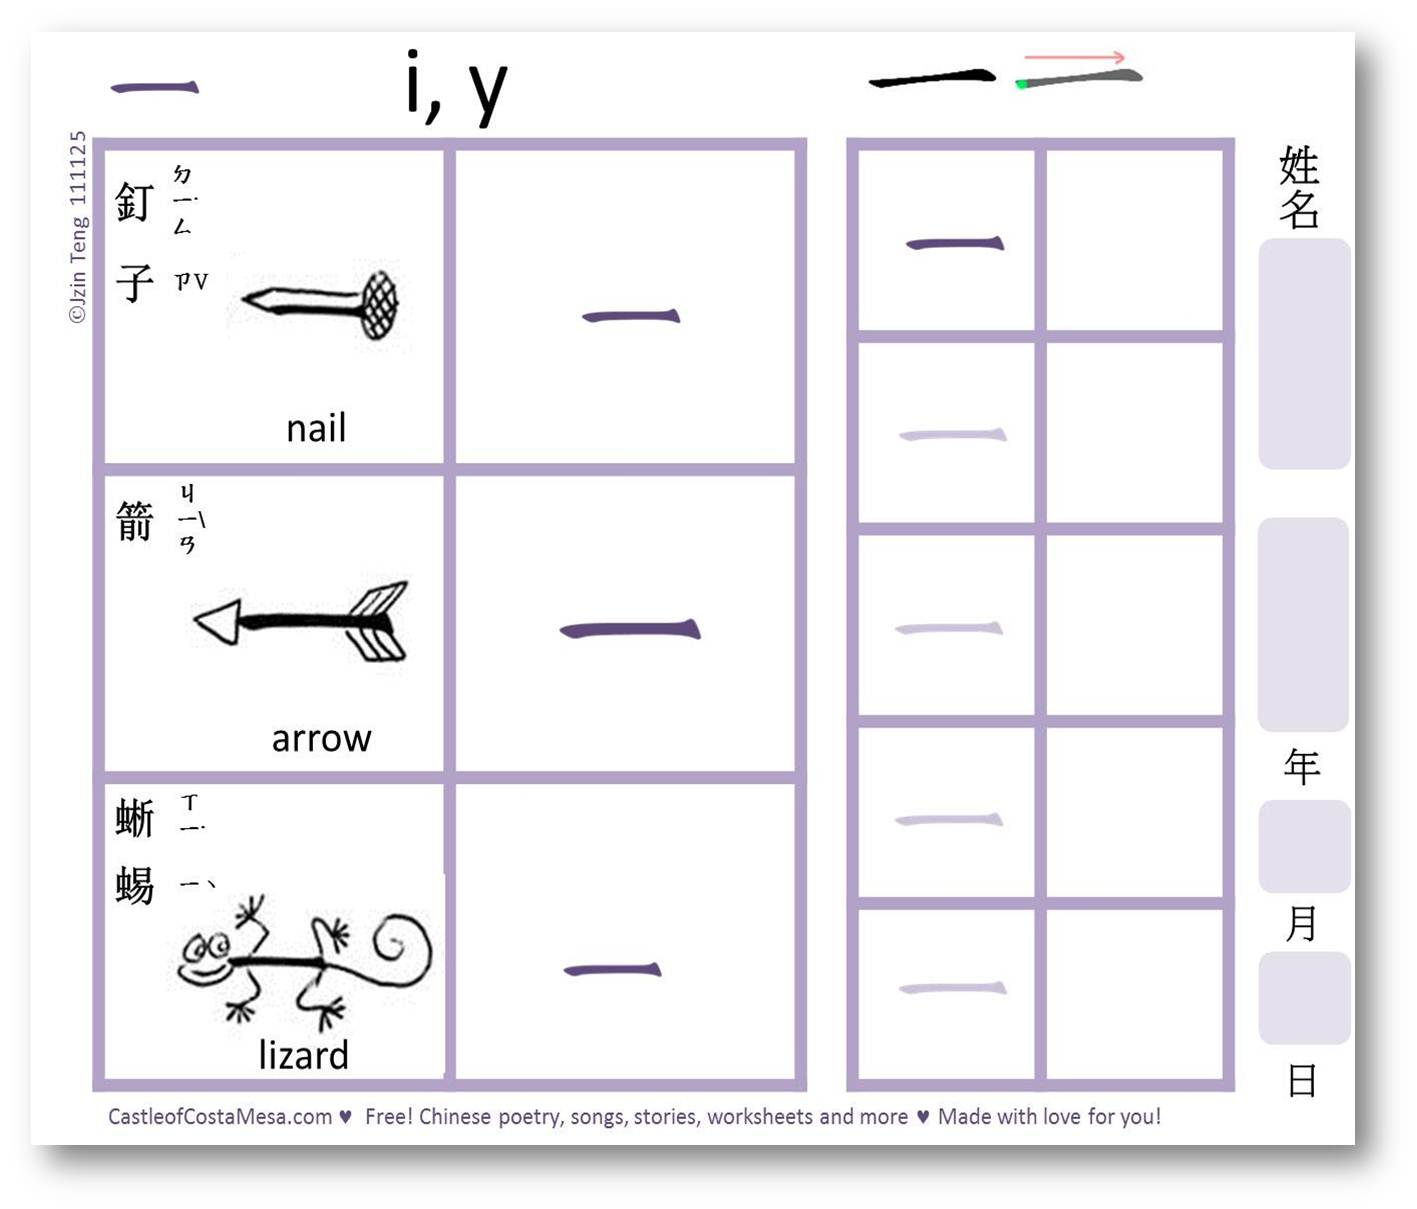 Bopomofo ㄅㄆㄇㄈ Mnemonic Worksheets For Children 注音符號助憶鍵 Castle Of Costa Mesa